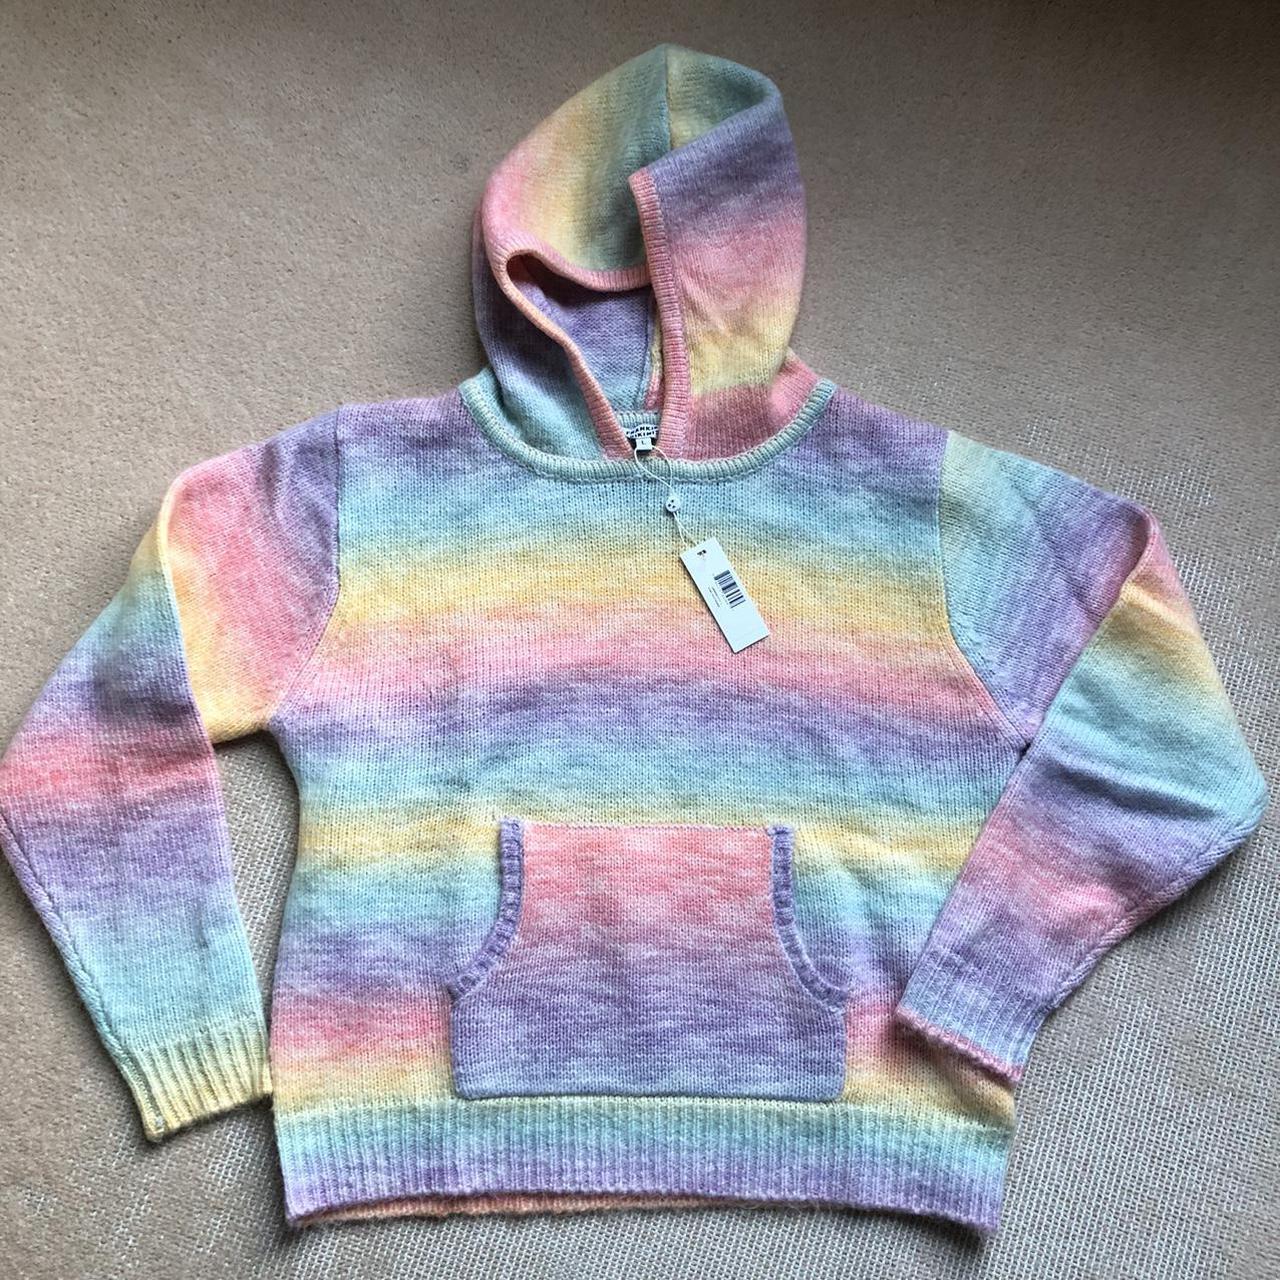 Product Image 1 - NWT Frankie's Bikinis Aidan Sweatshirt (also